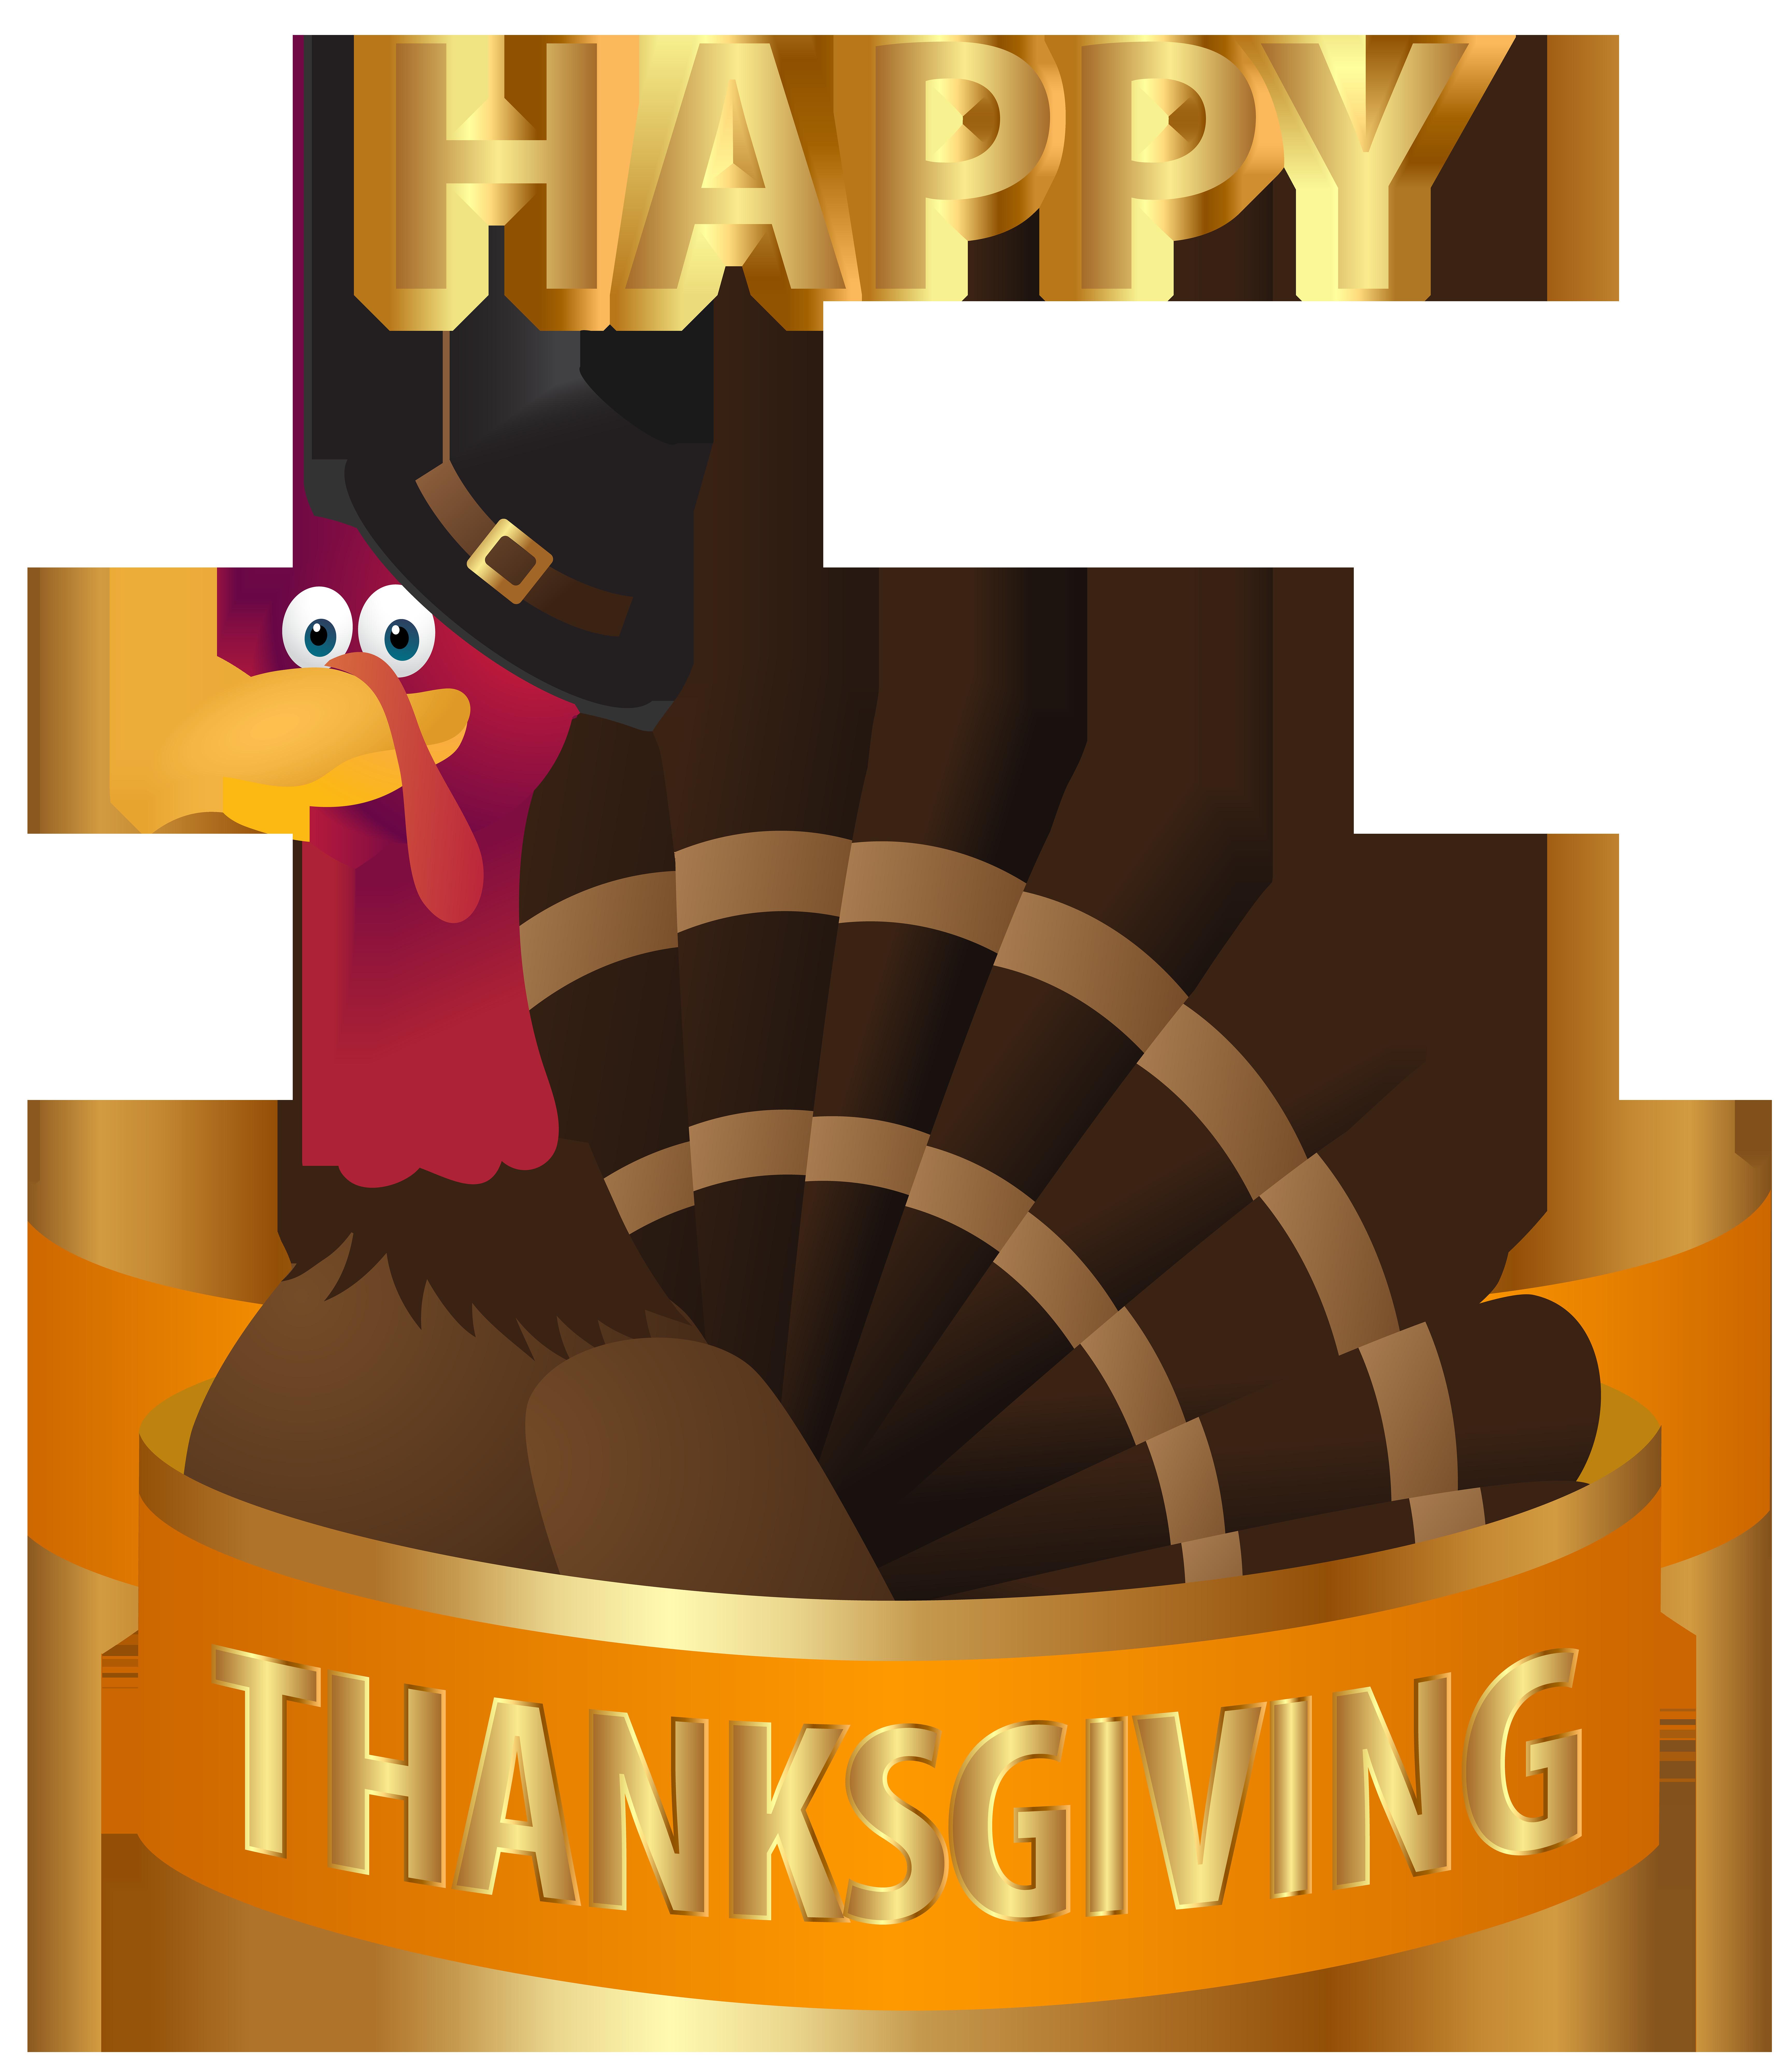 Thanksgiving Turkey Png  Happy Thanksgiving Turkey Transparent PNG Image